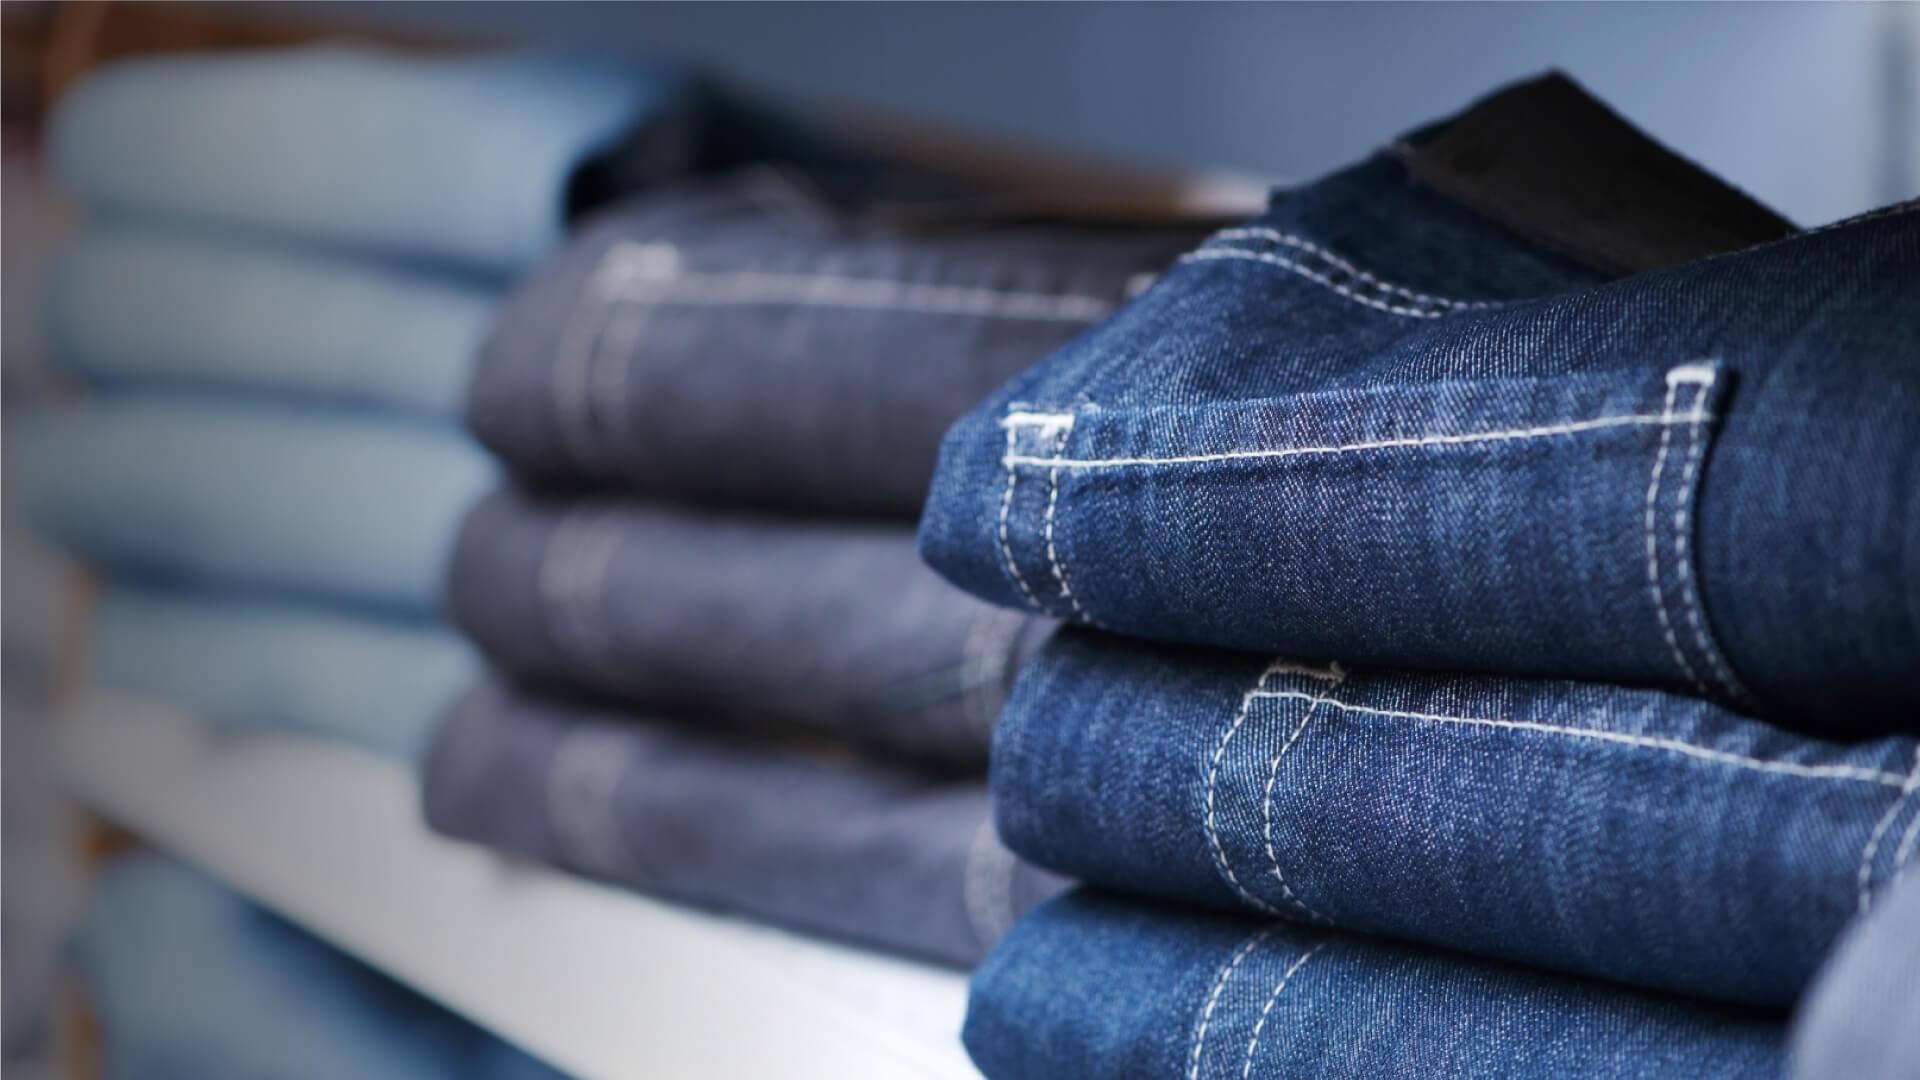 Fabricante de ropa